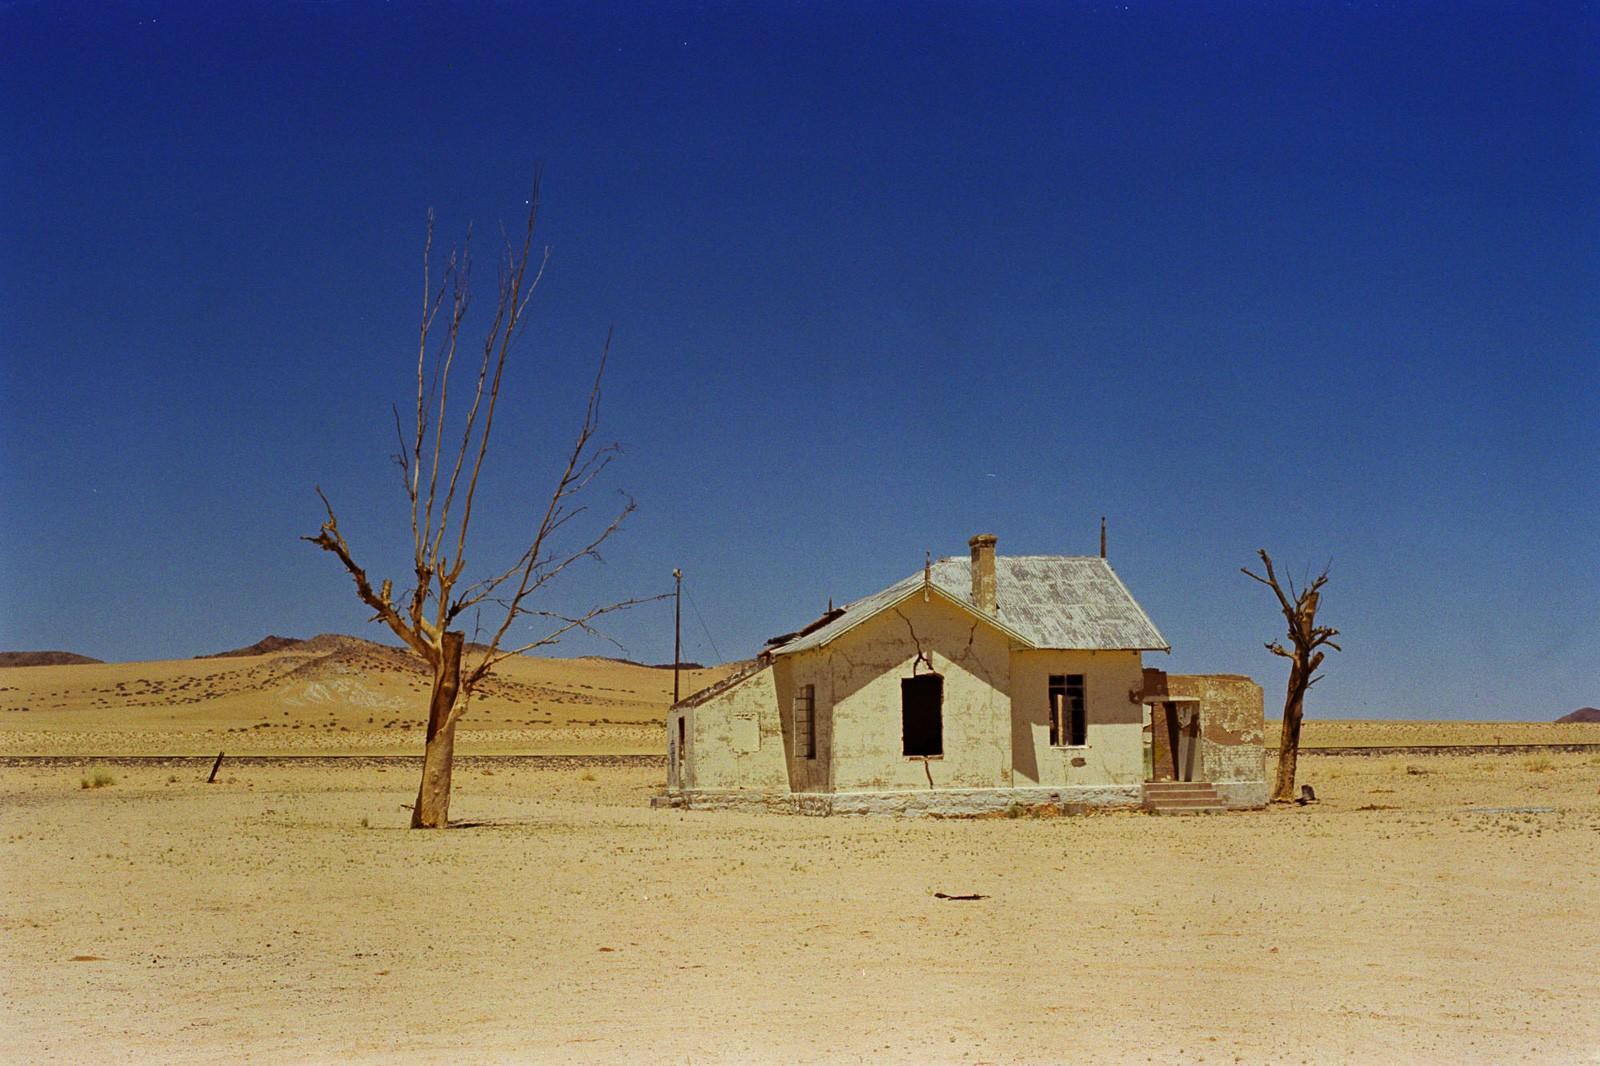 namibia abandoned train station in the desert